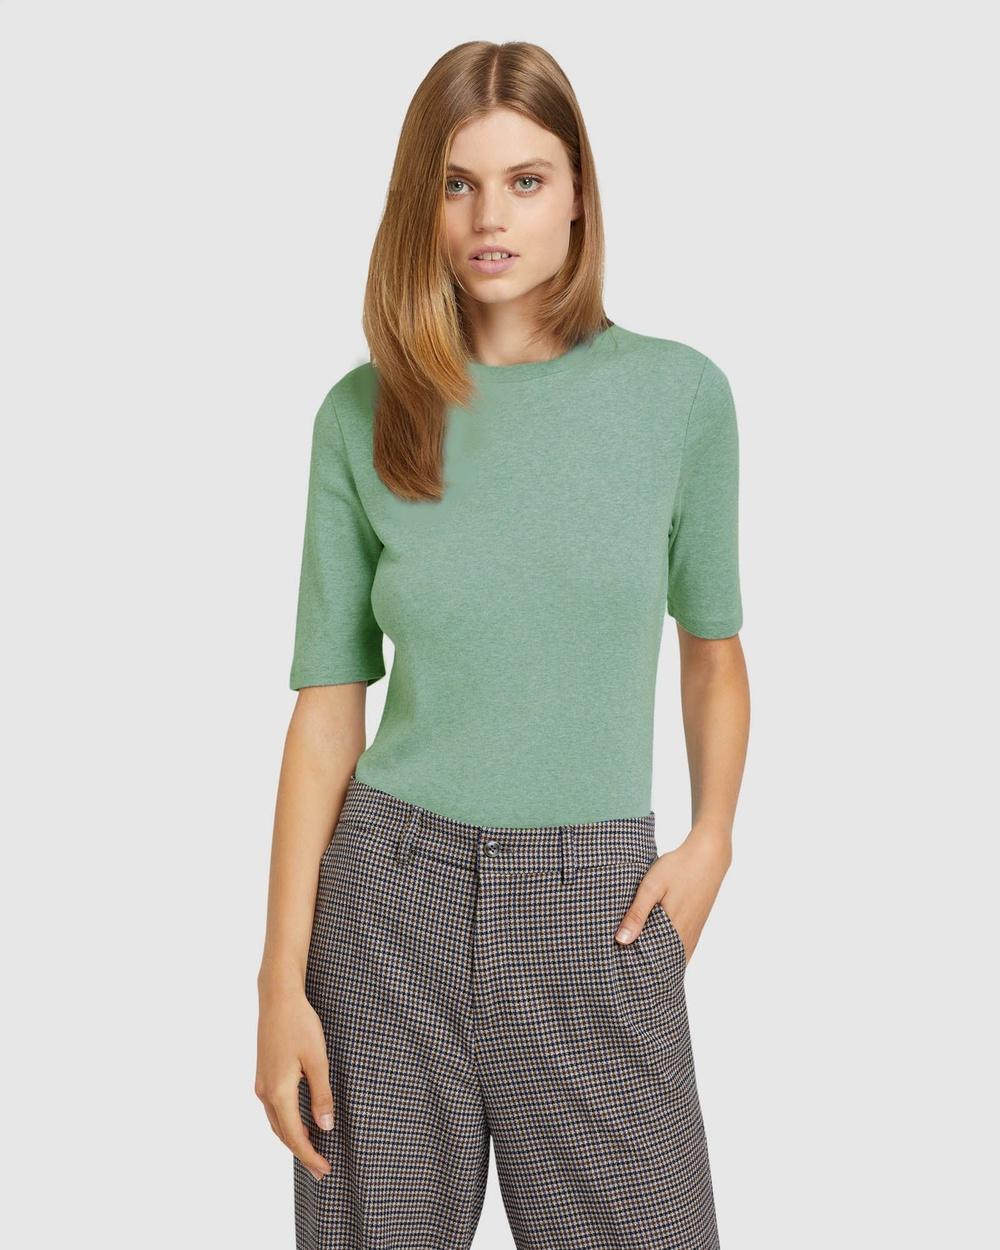 Oxford Jasmine Rib T shirt Long Sleeve T-Shirts Green T-shirt Australia